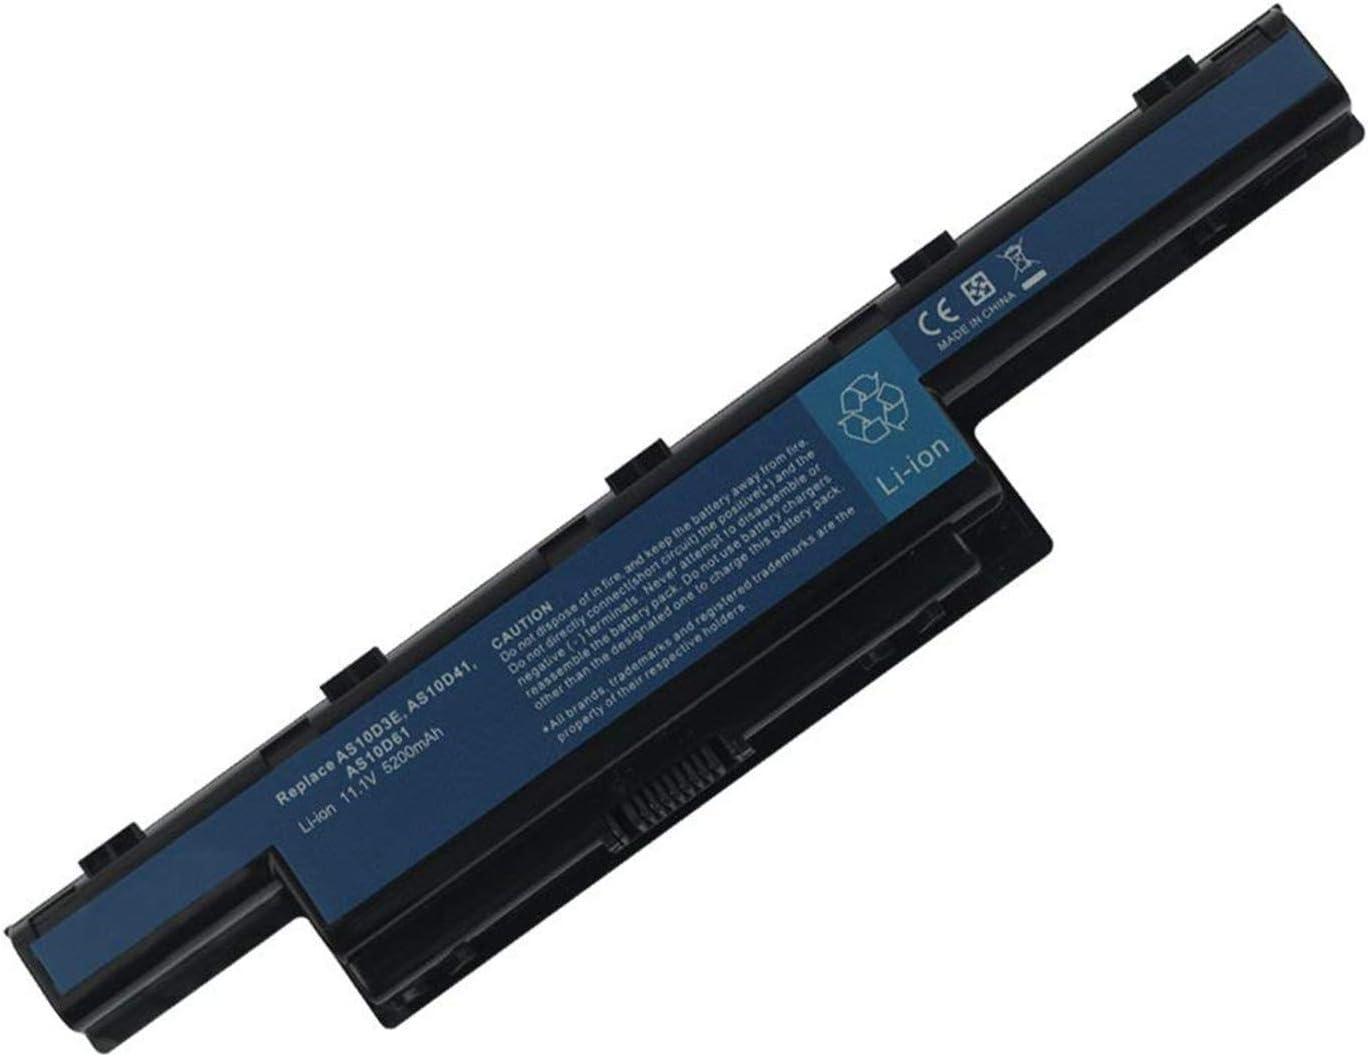 Batteria 5200mAh AS10D31 per Acer Aspire 5749Z 5750 5750G 5750Z 5750ZG